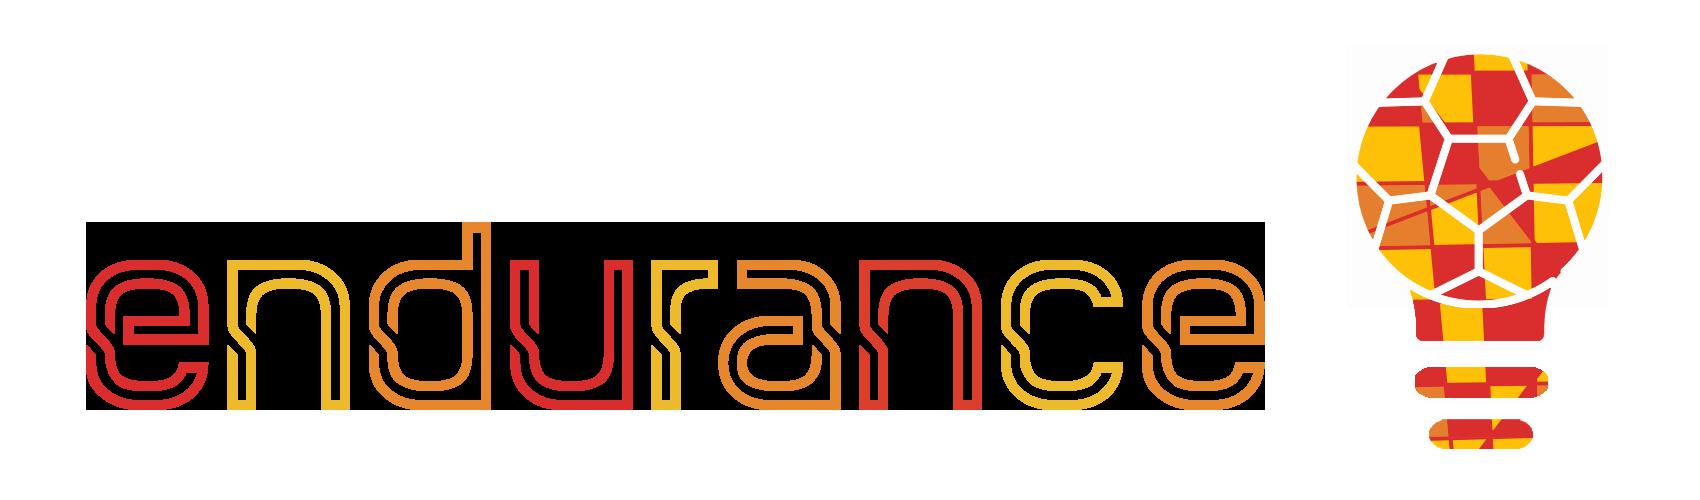 endurance-HD